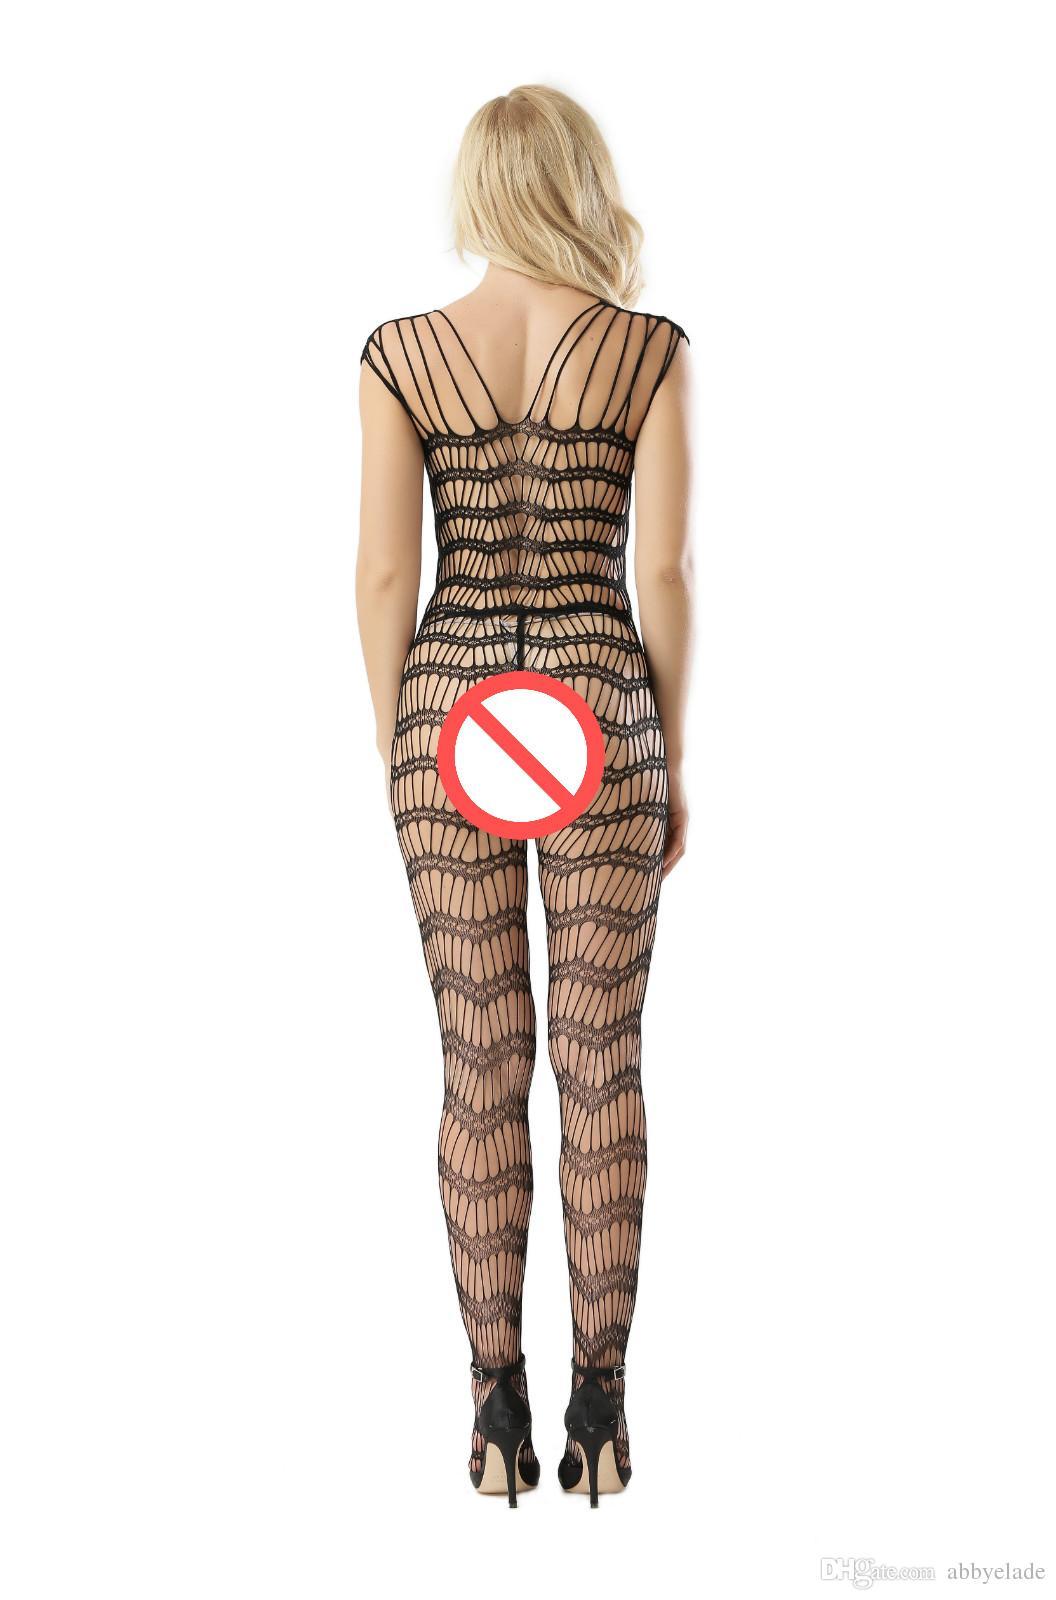 2017 Nuovo arrivo Lingerie Hot costumi sexy Net calza trasparente Bodystockings Kimono Pigiama Sleepwear Dress le donne